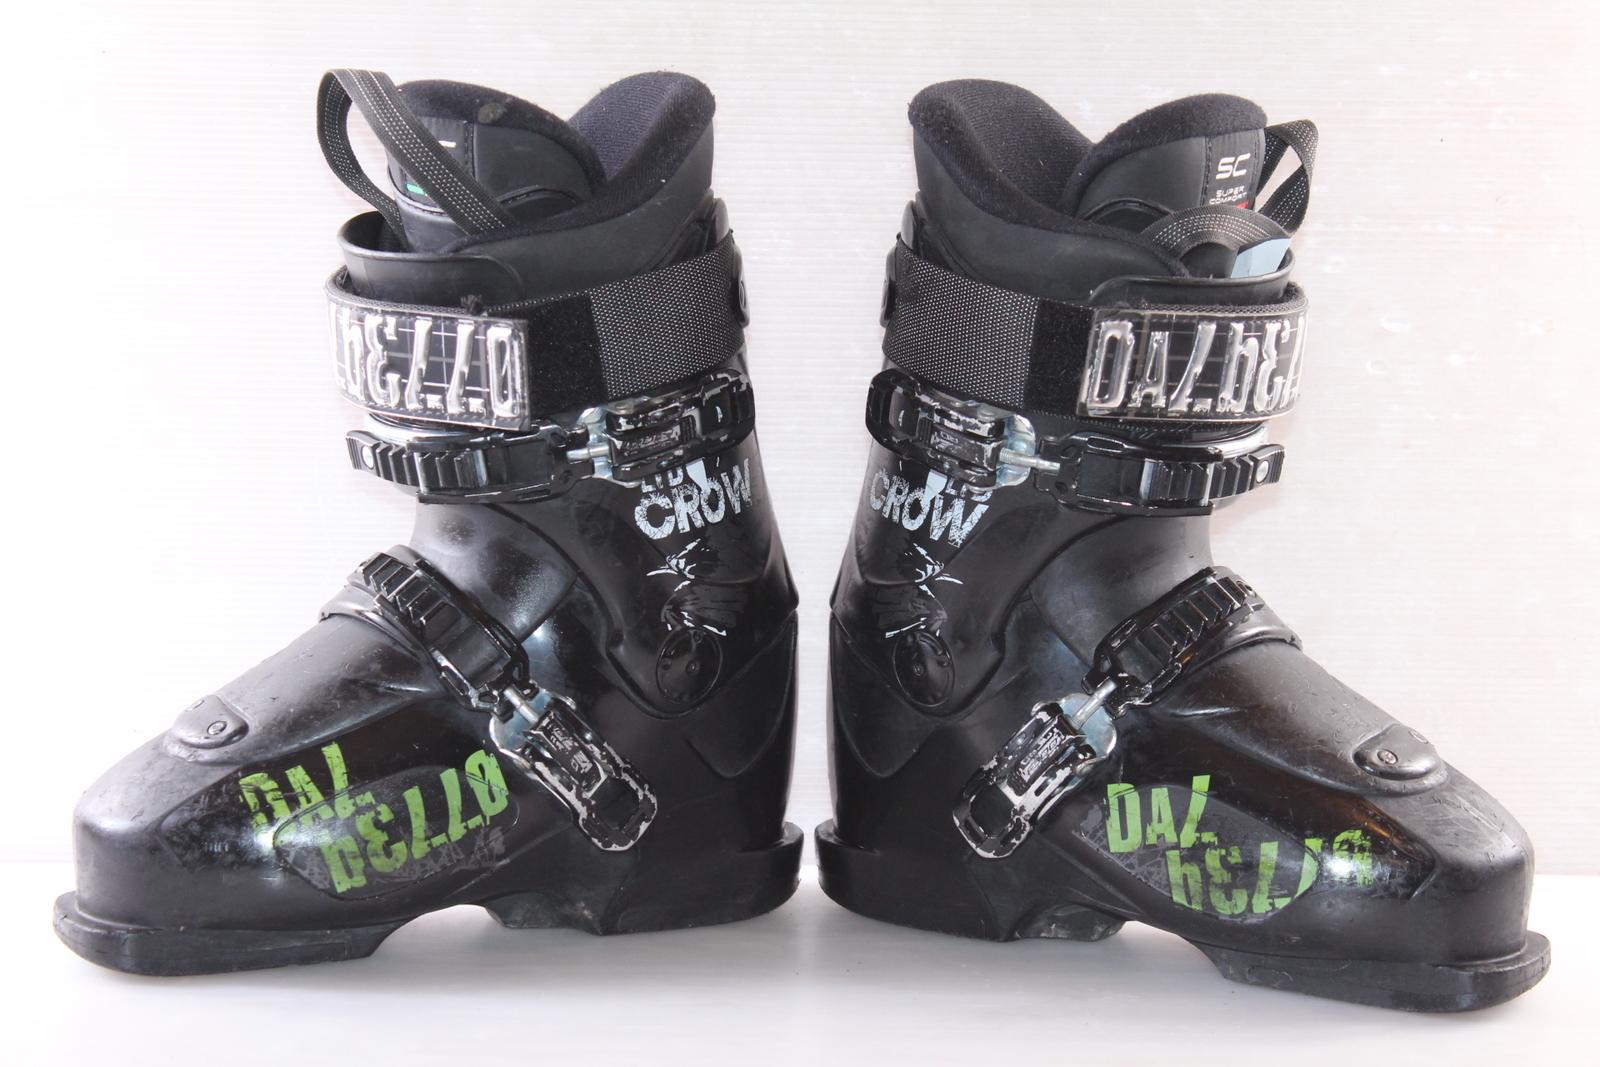 Lyžařské boty Dalbello Crow Ltd vel. EU38 flexe 70